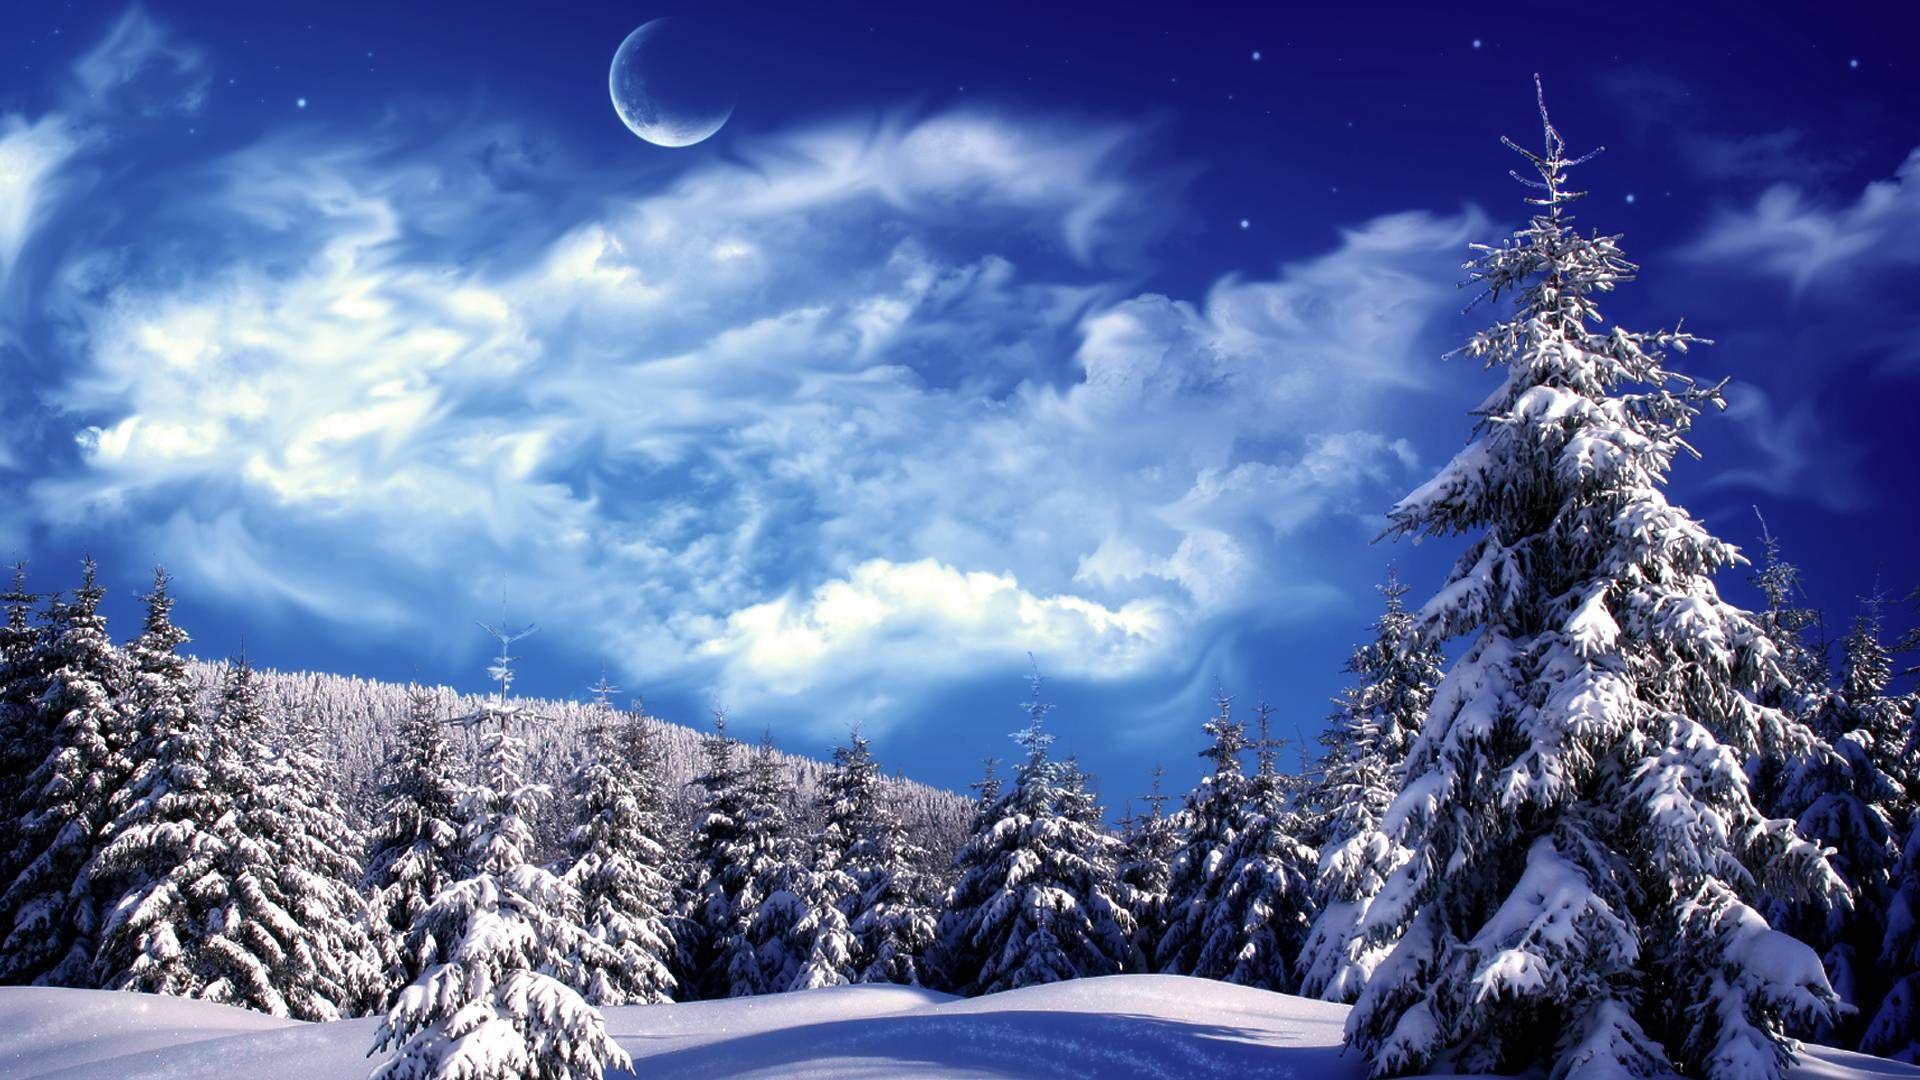 Pin By Mukta Sharma On A Very Merry Christmas Winter Scenery Winter Wallpaper Hd Winter Landscape